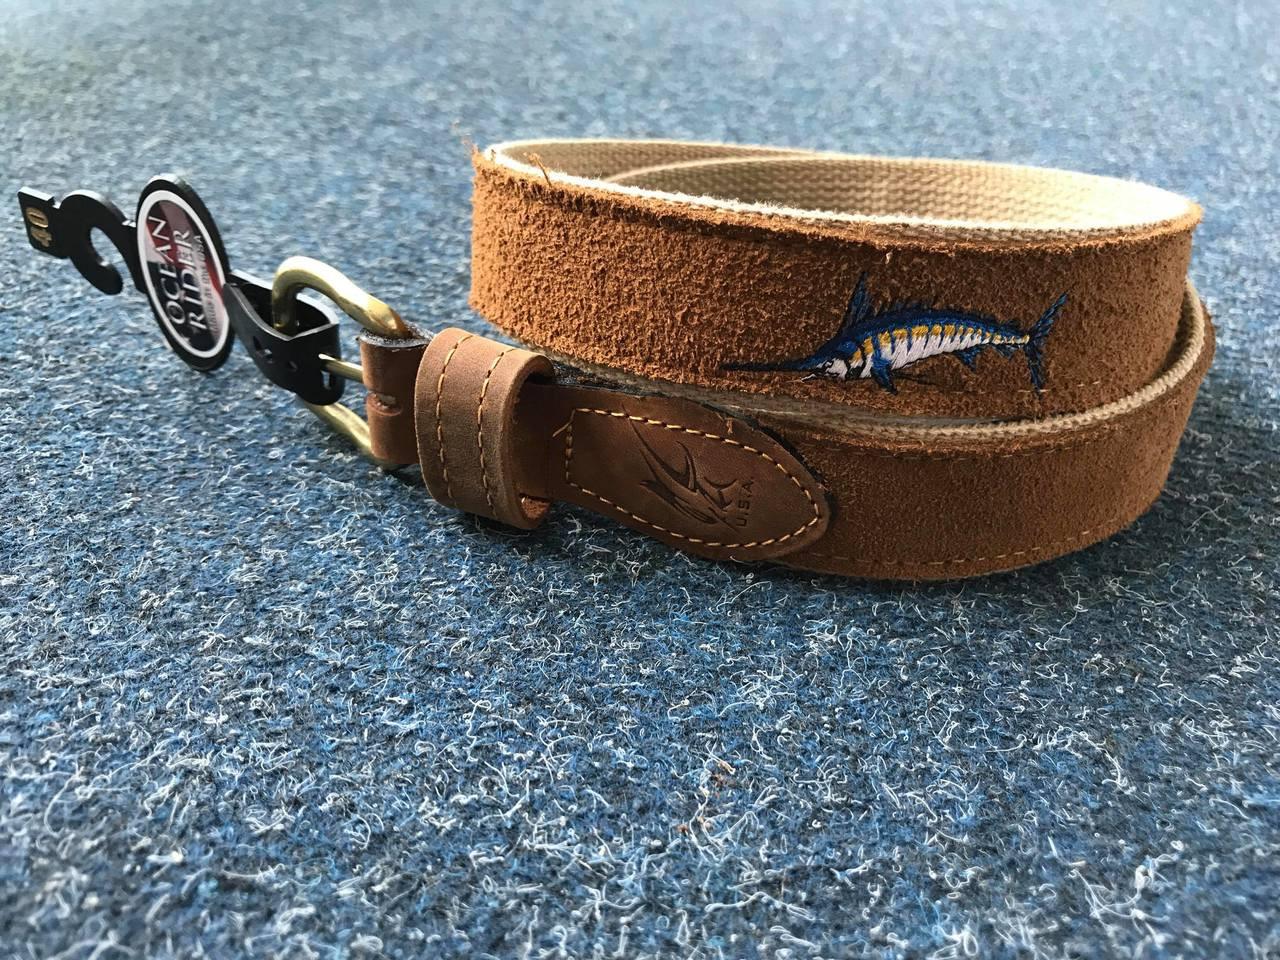 Ocean Rider Handmade Leather Marlin Embroided Belt